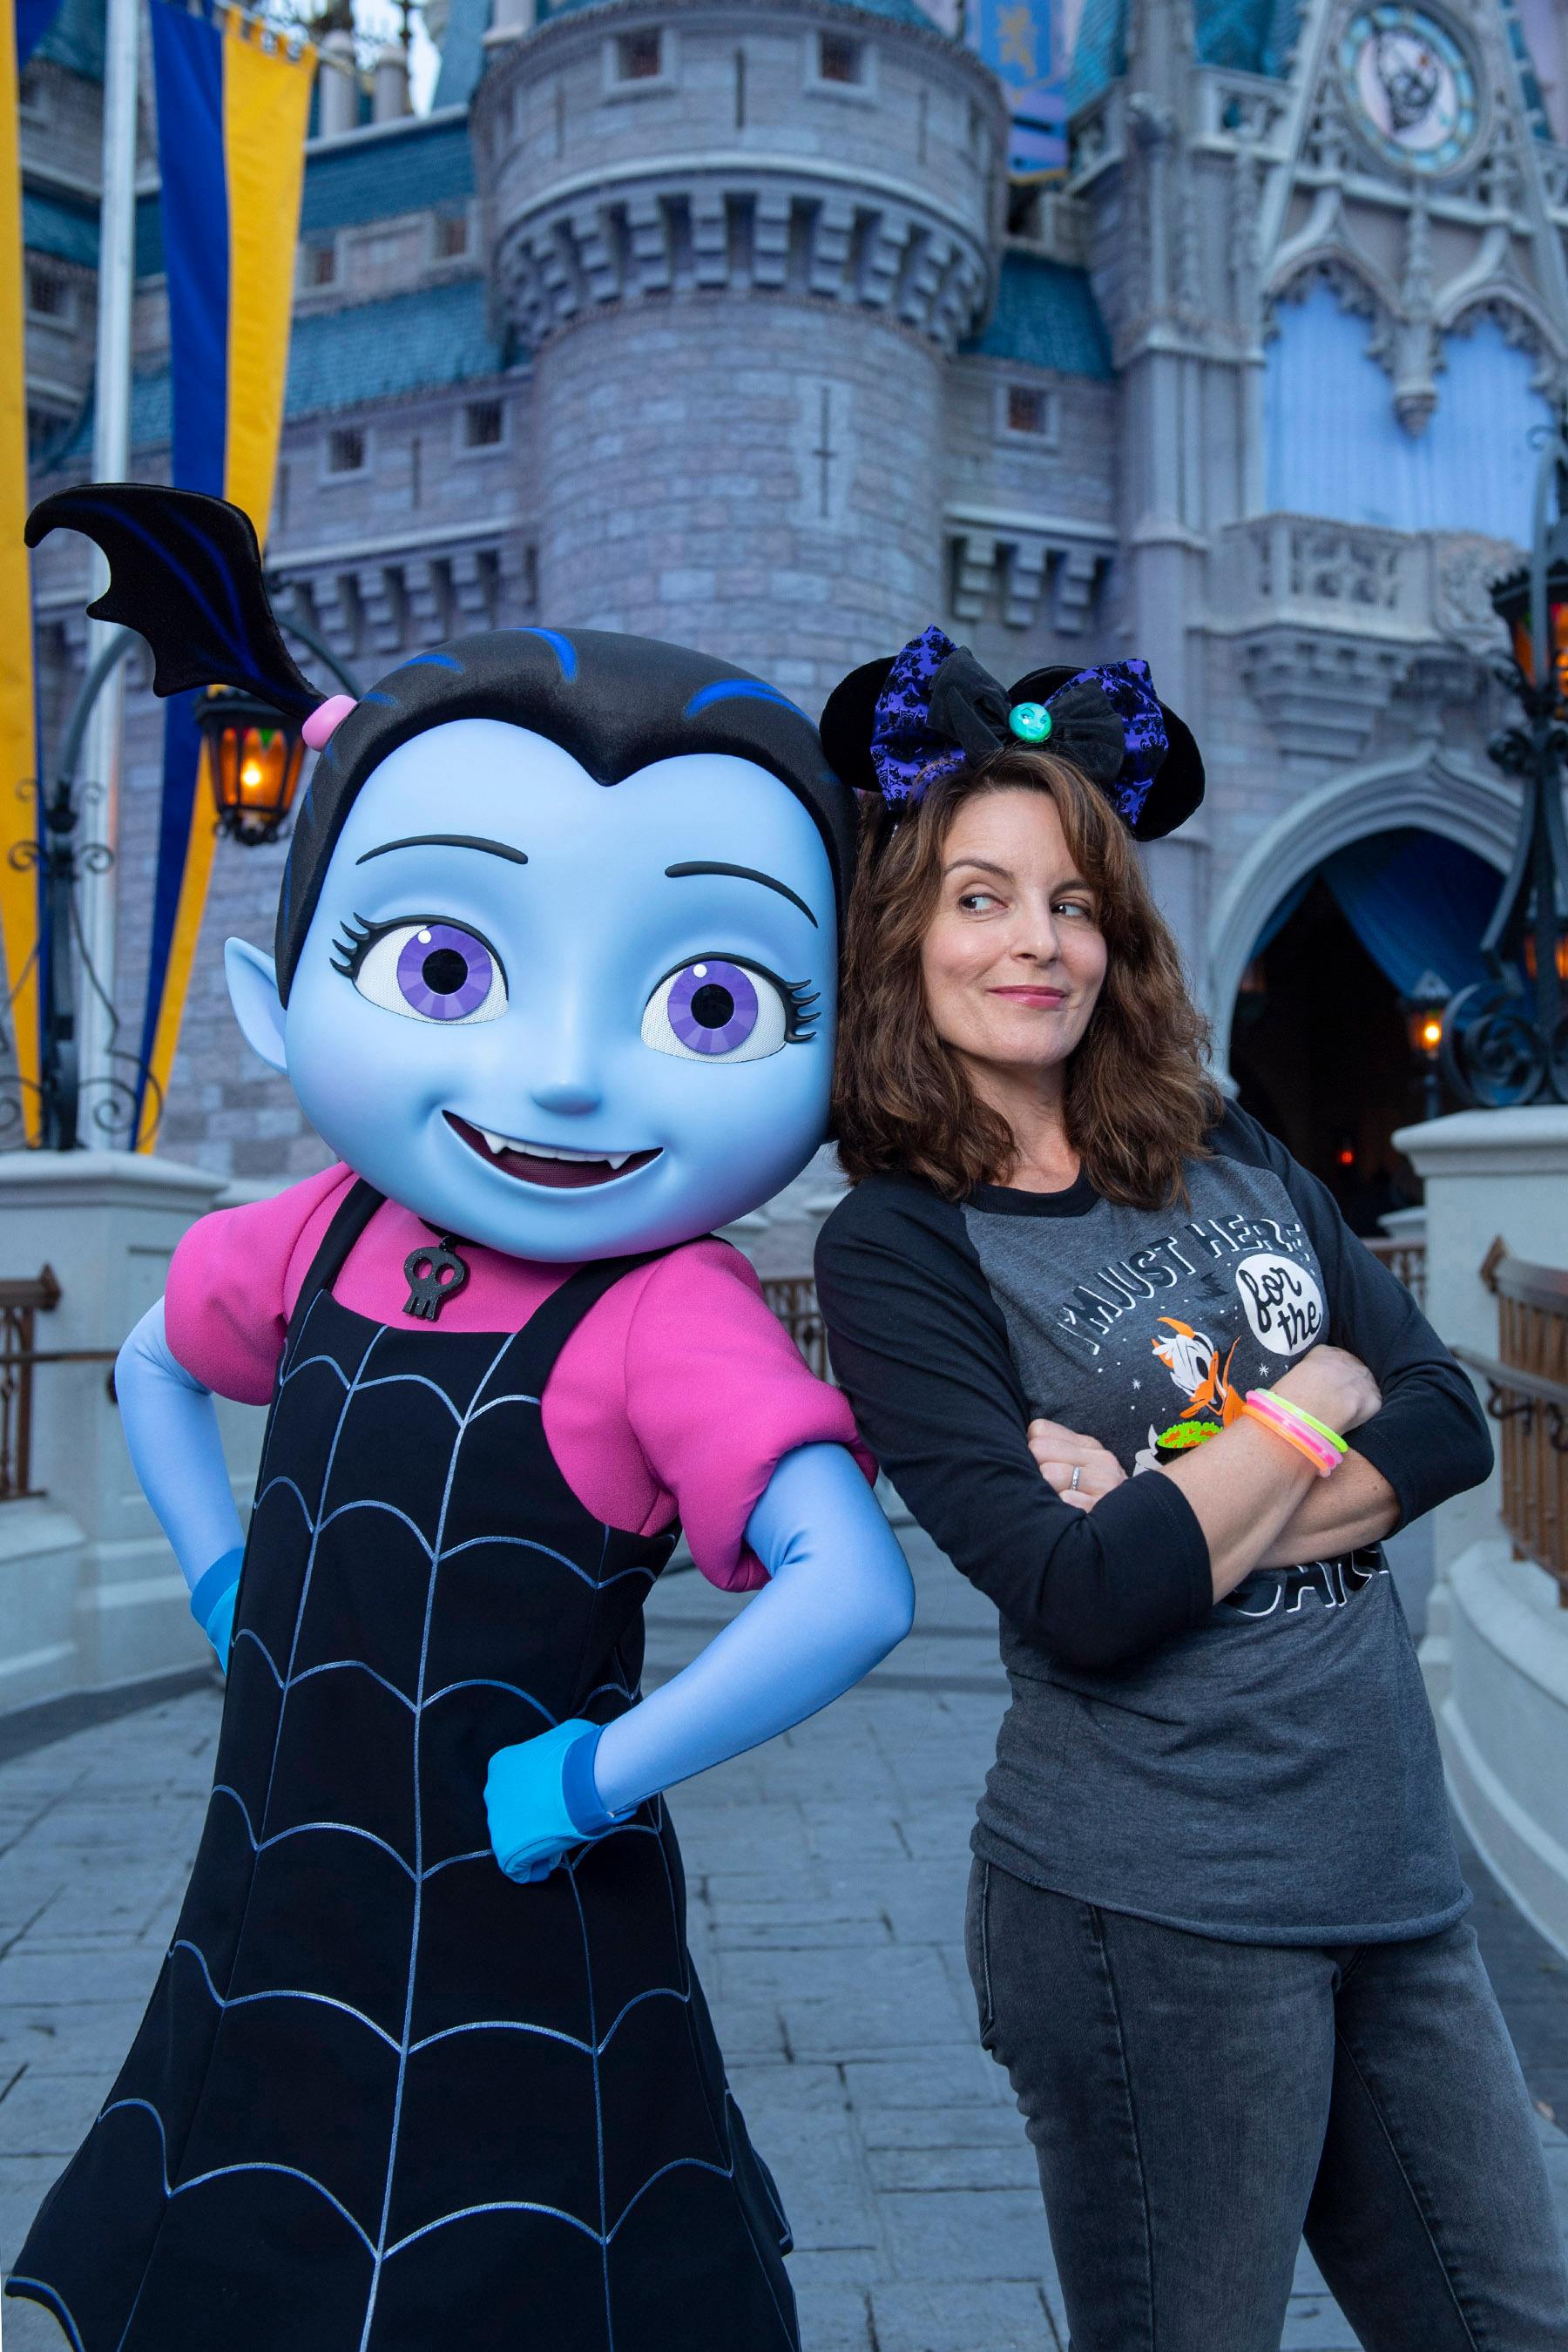 Tina Fey poses with Disney Junior character Vampirina at Walt Disney World in Florida on Oct. 8, 2018.